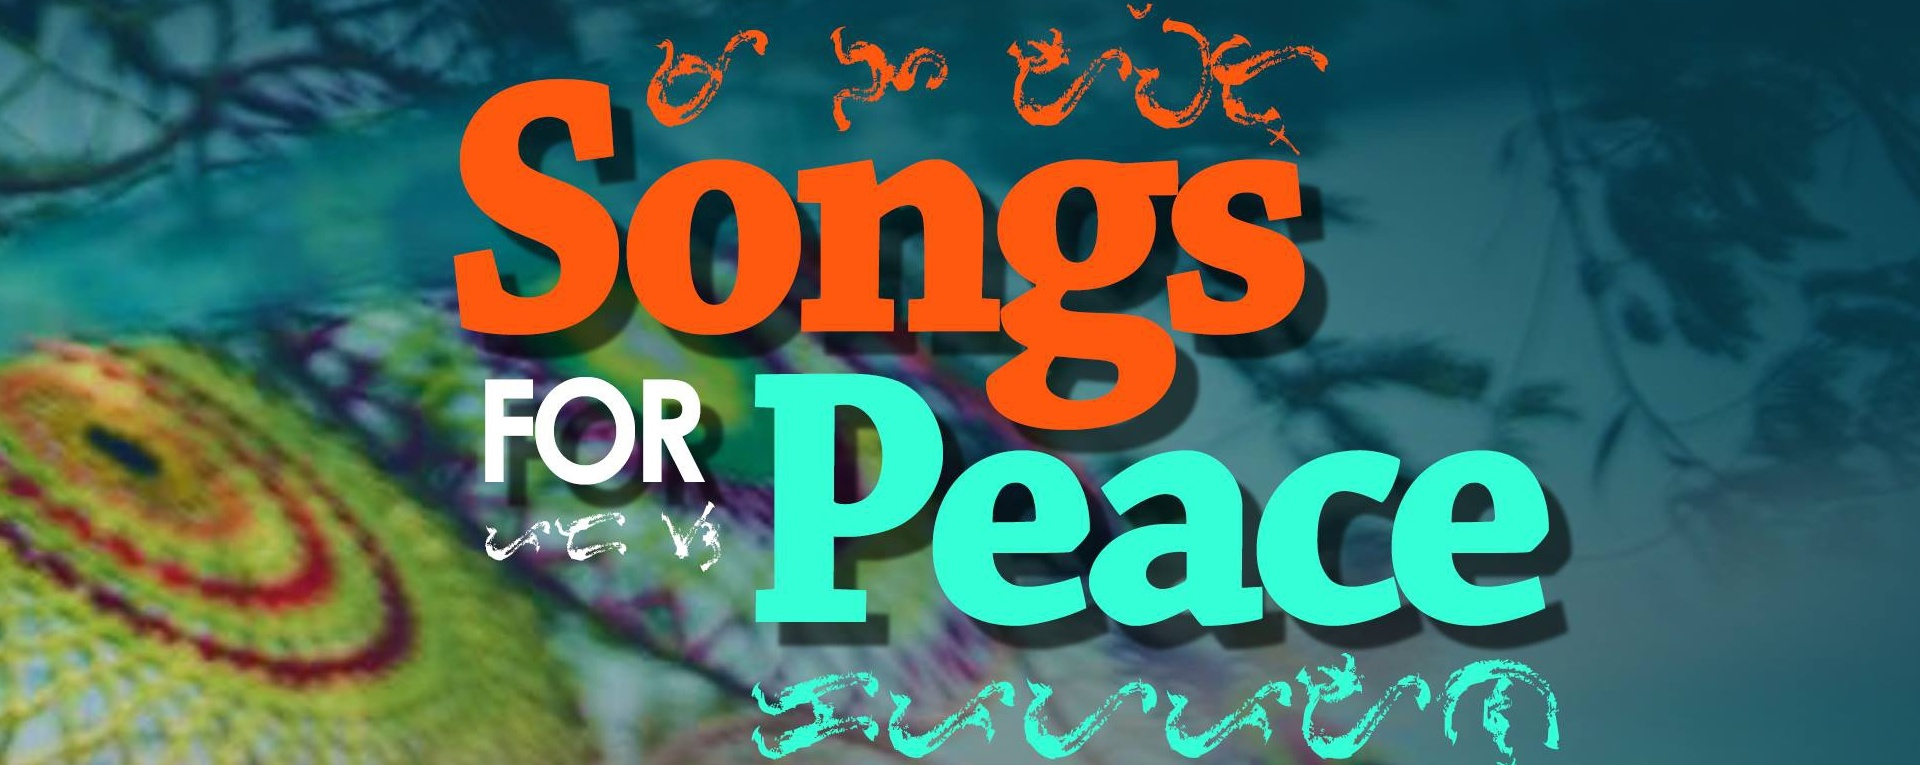 Songs for Peace sa Conspiracy